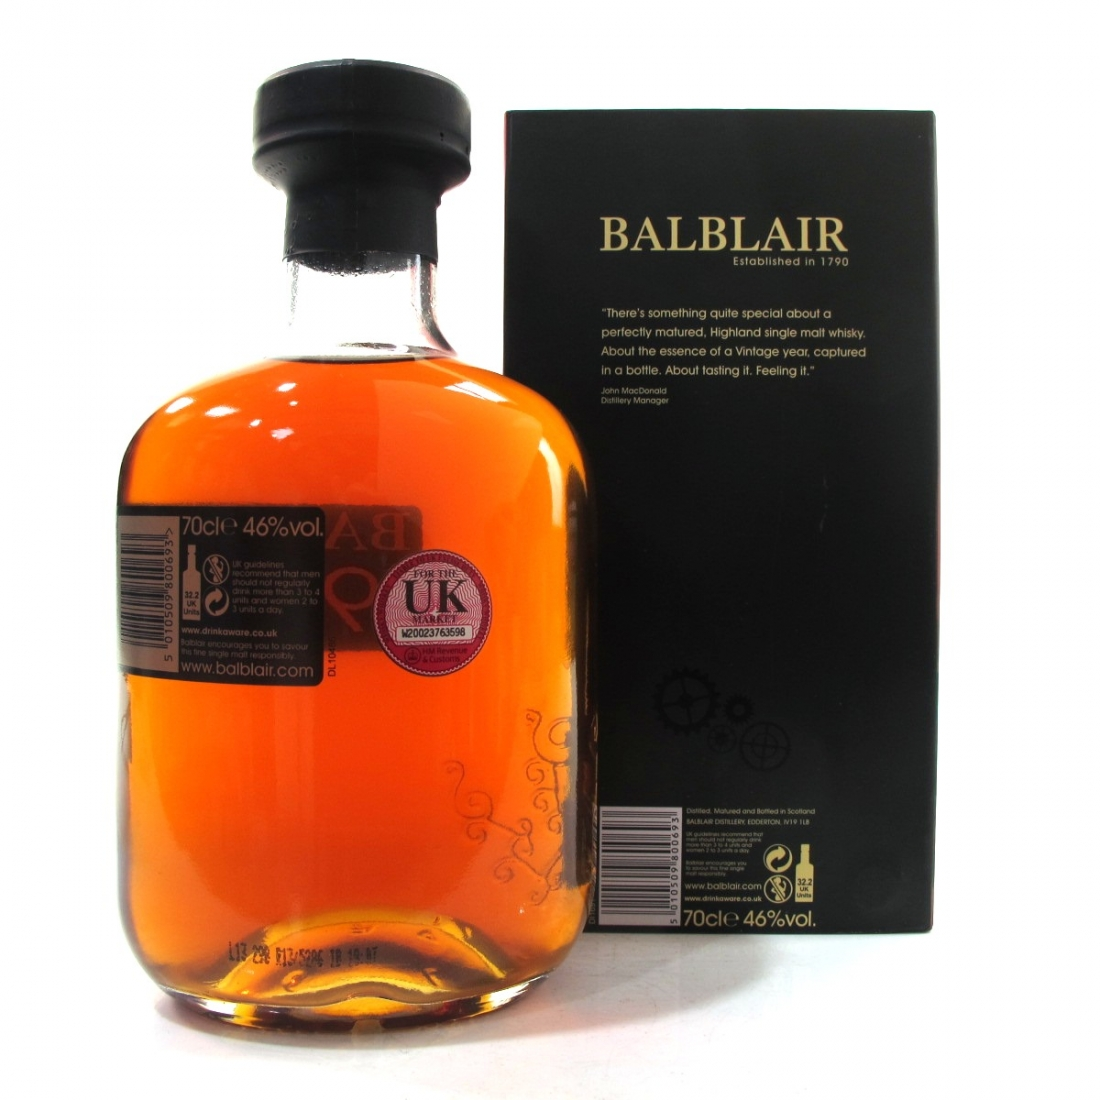 Balblair 1990 2nd Release 2013